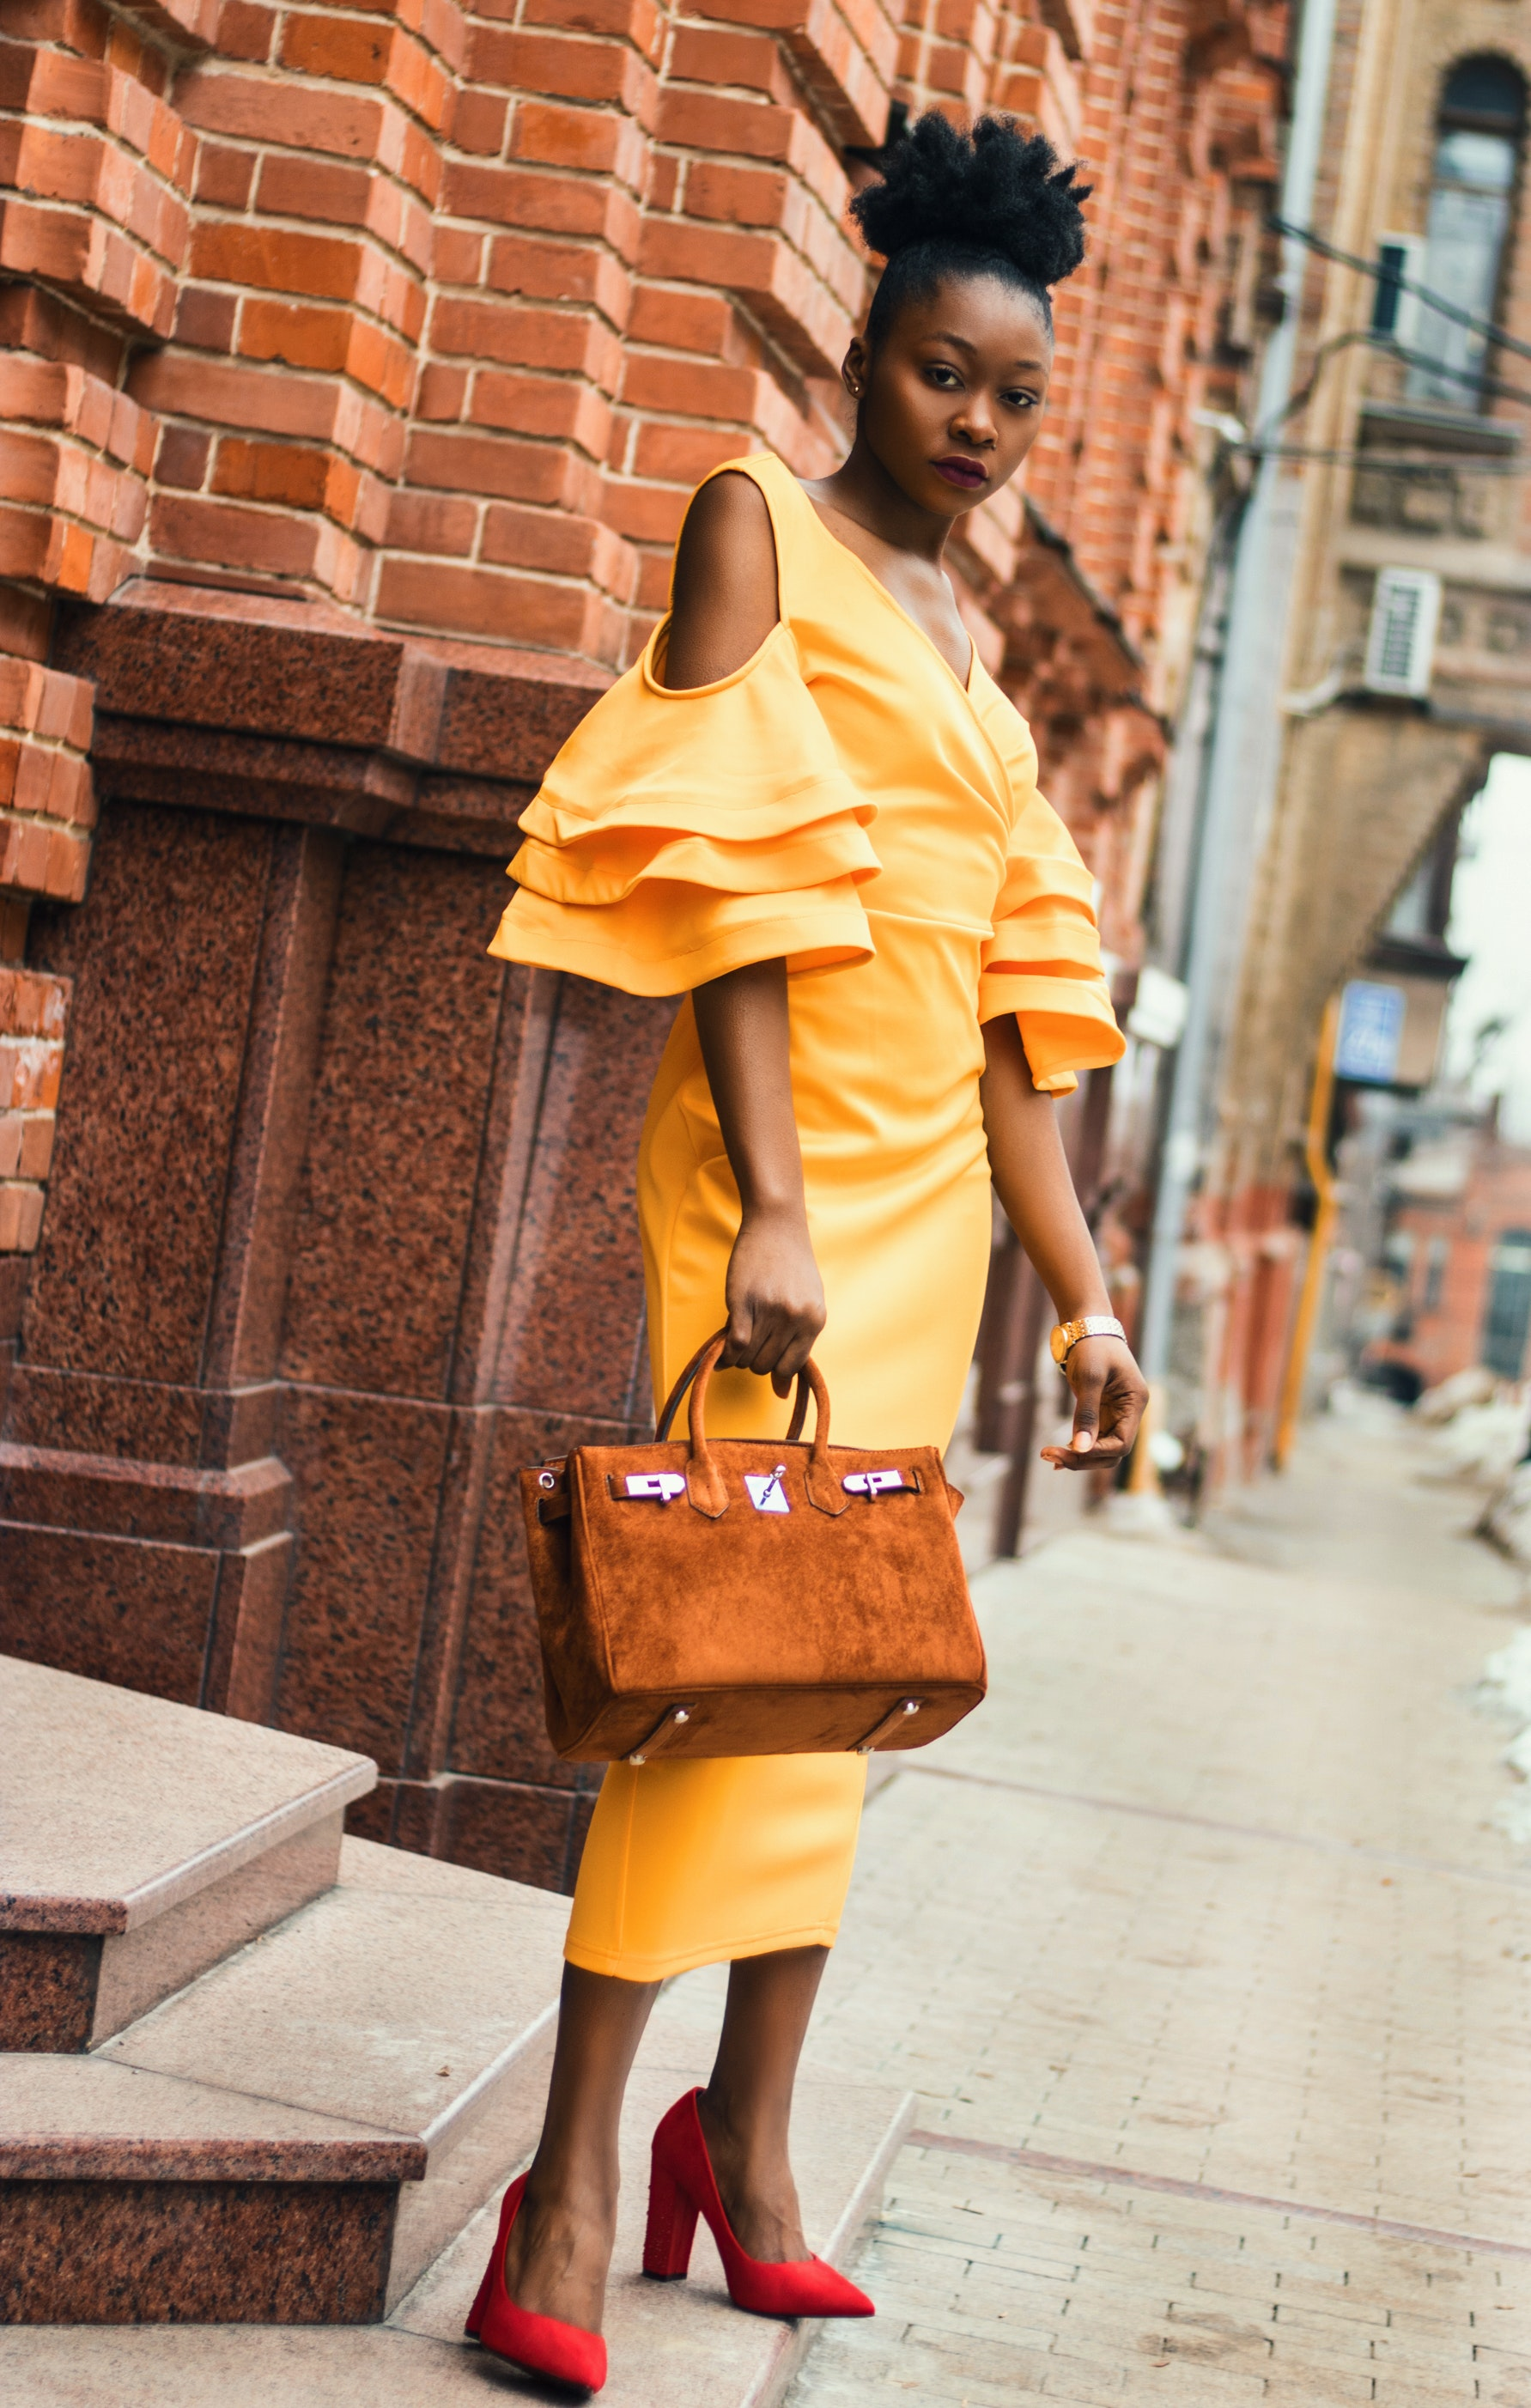 brick-wall-brown-bag-daylight-1936850.jpg